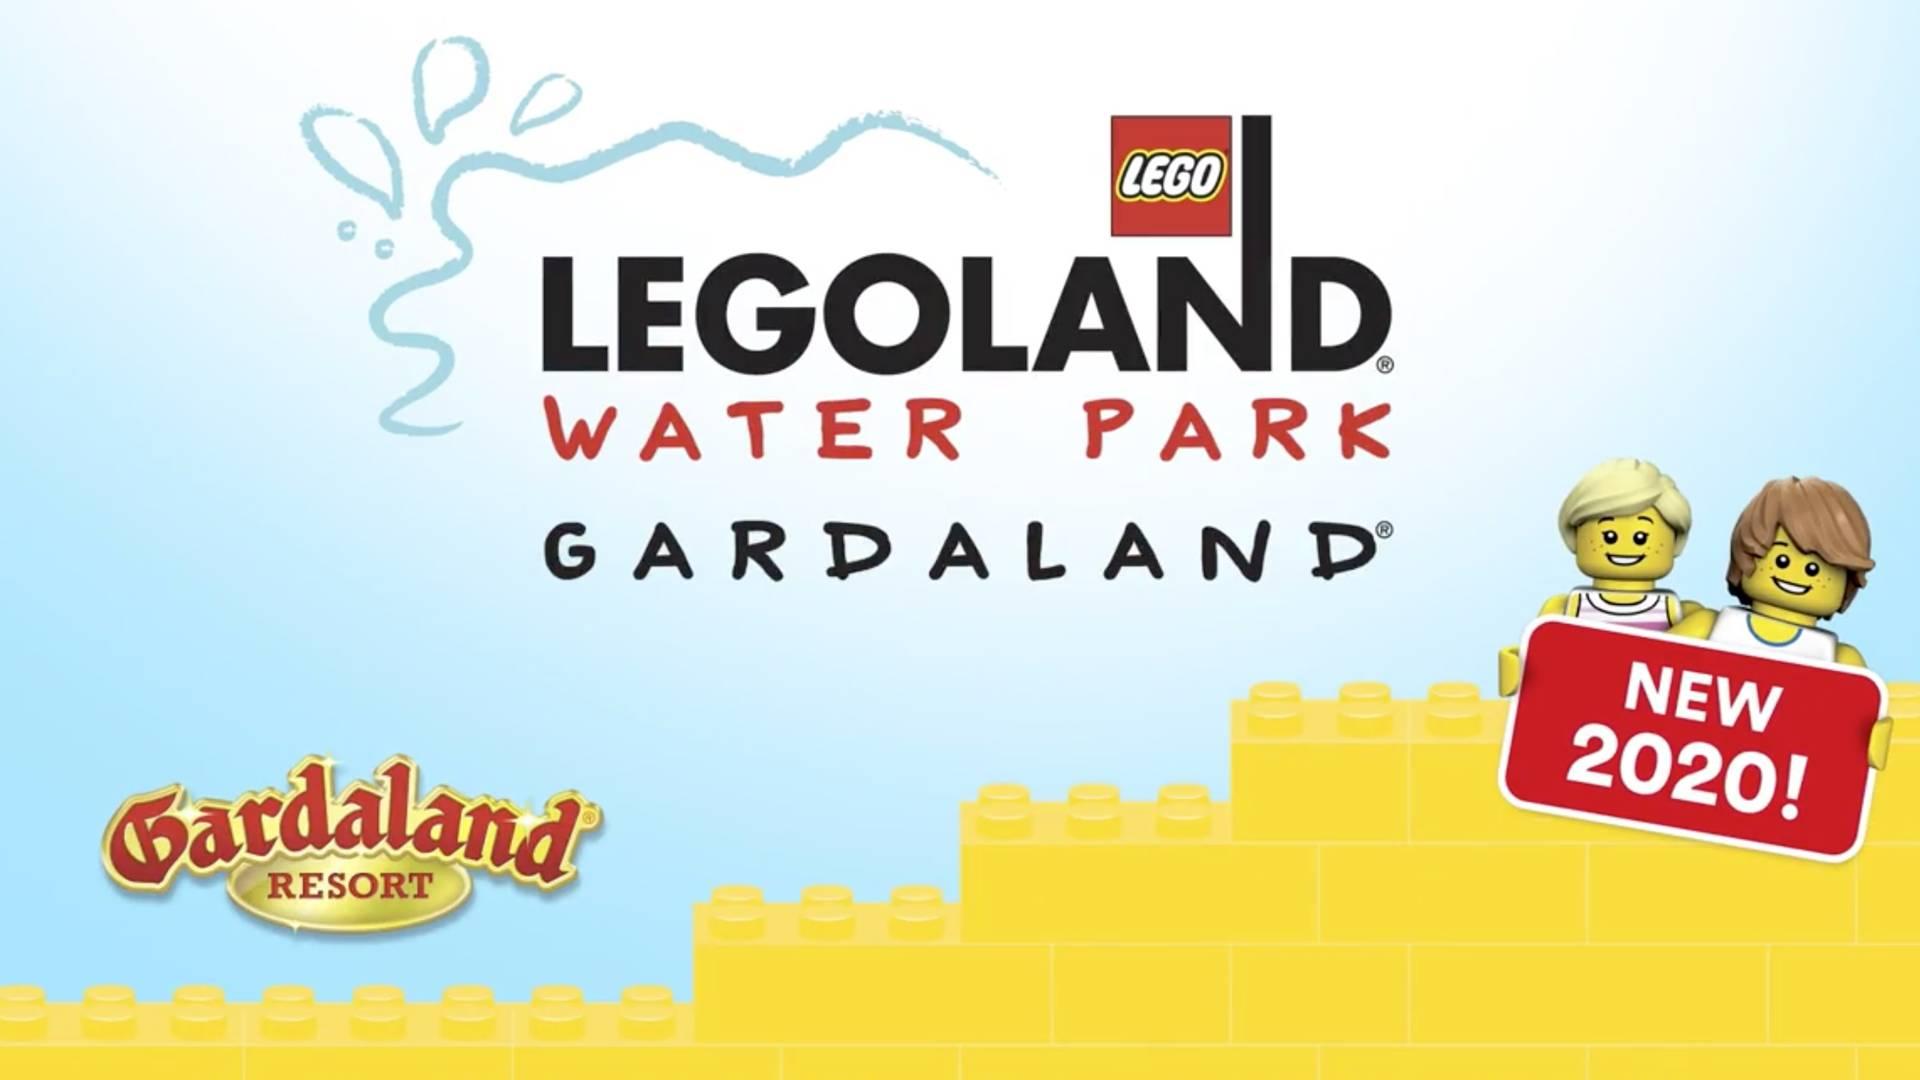 Miniland Legoland Water Park Gardaland